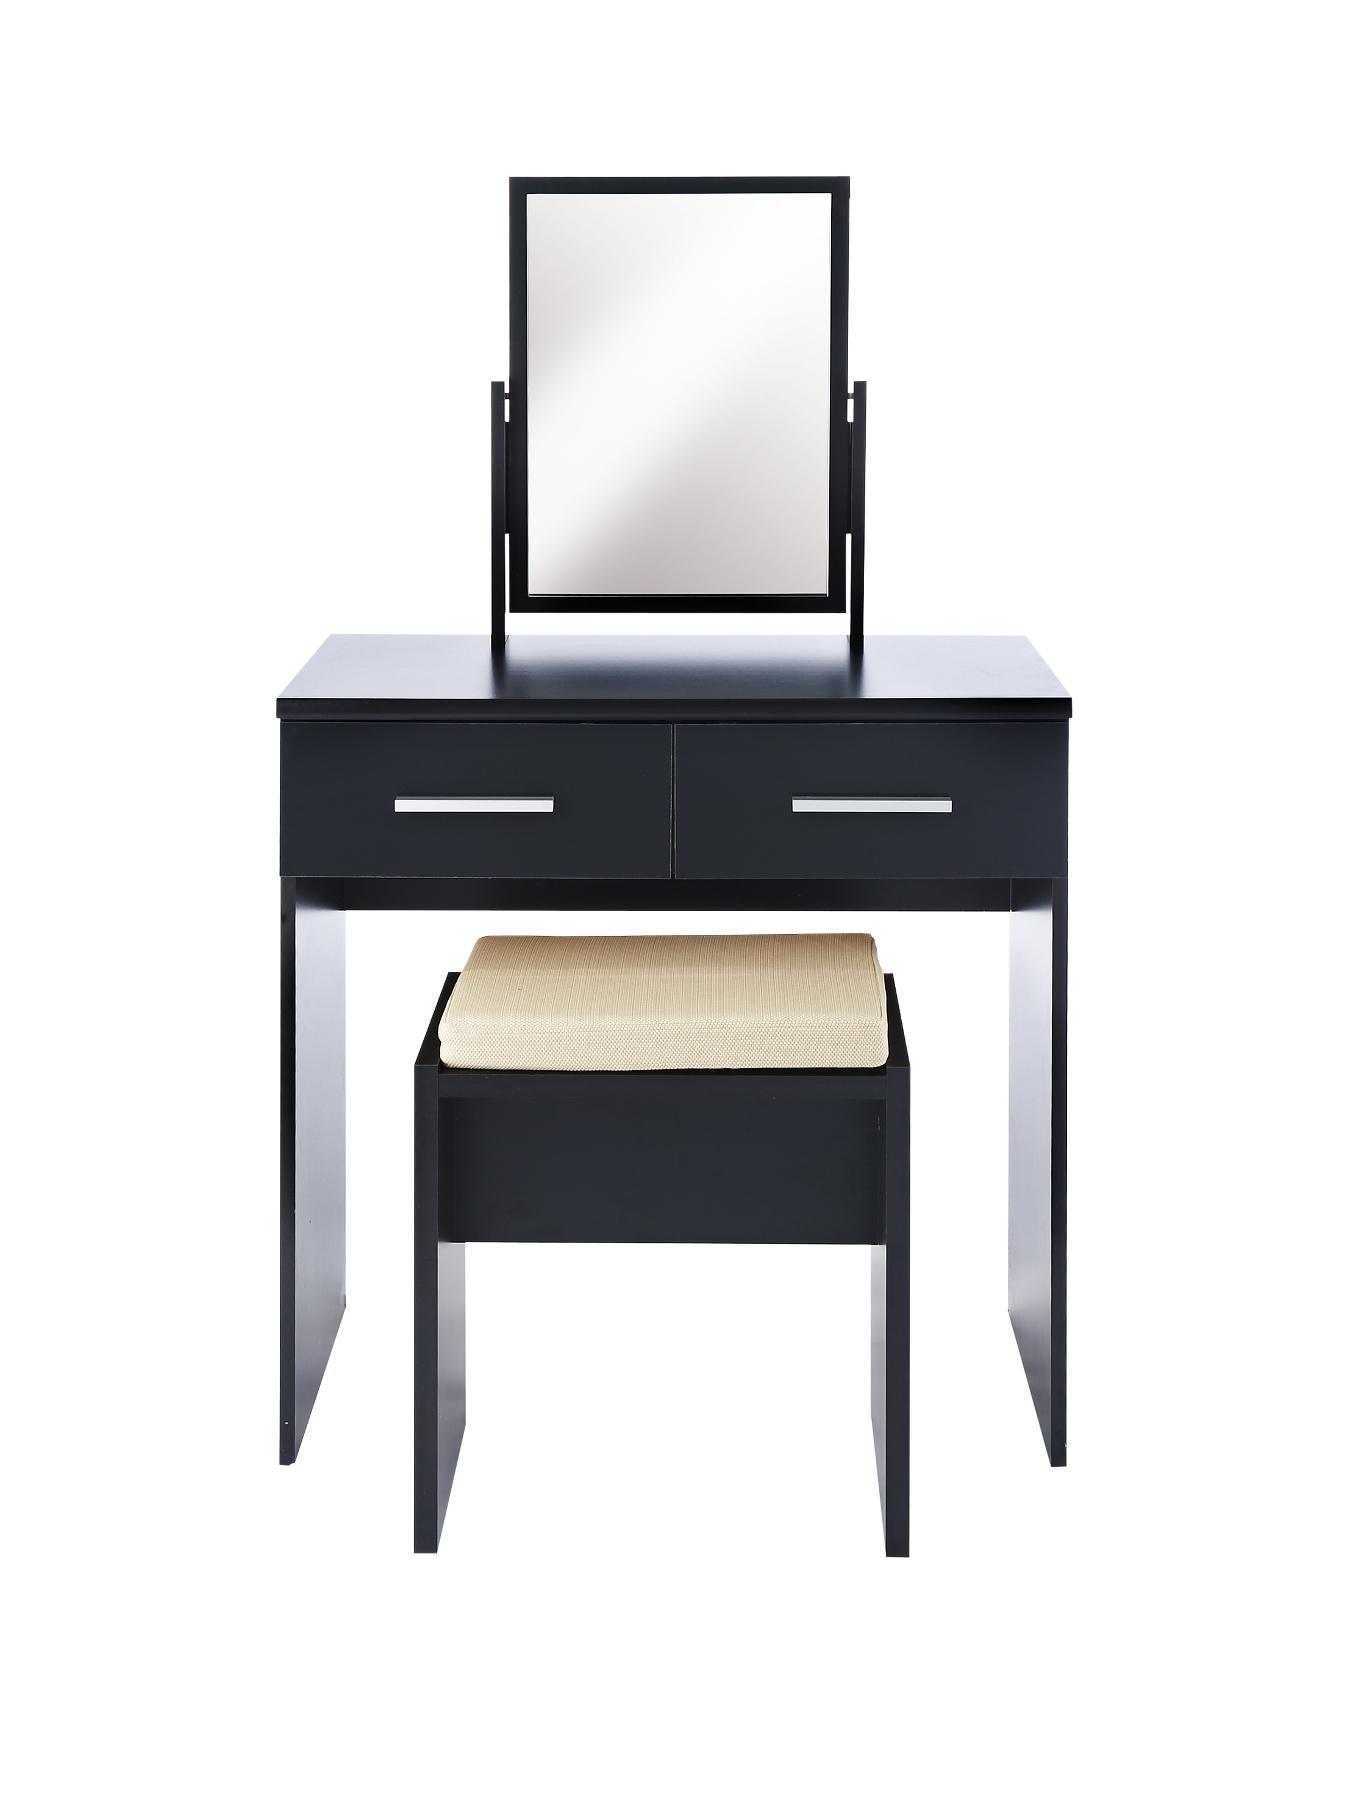 Prague High Gloss Dressing Table, Stool and Mirror Set - Black, Black,White